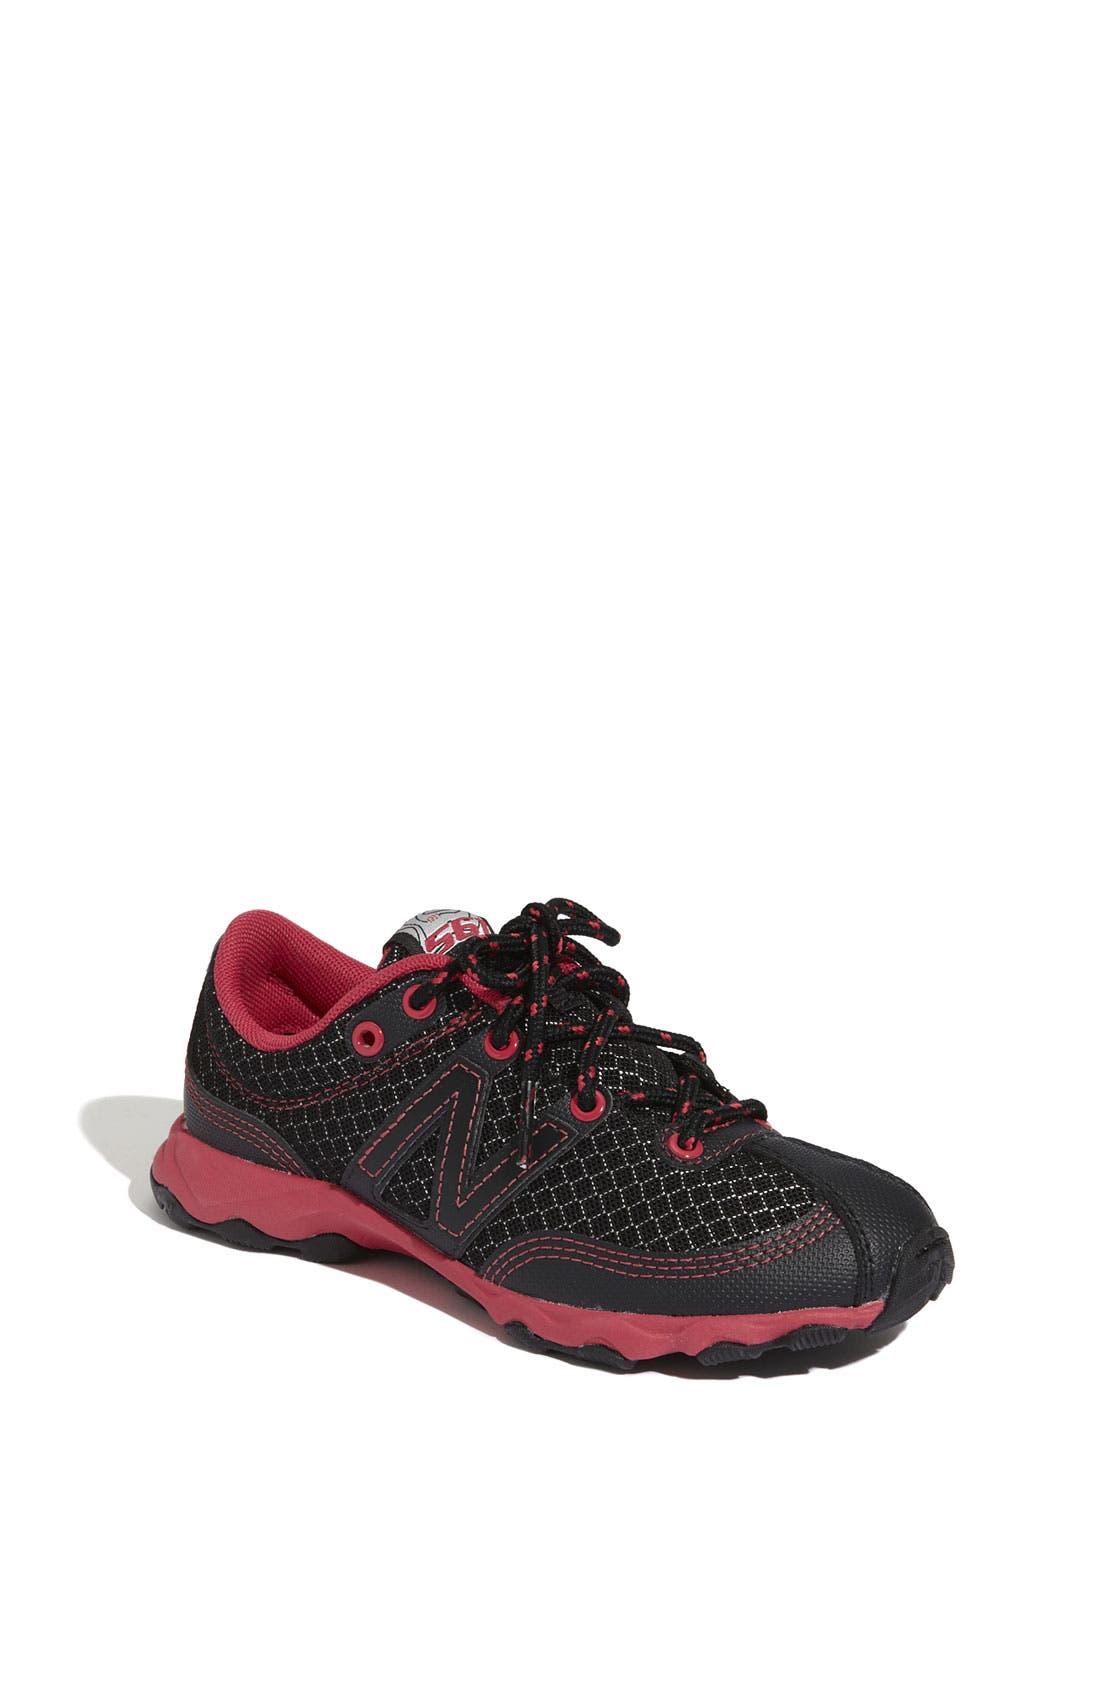 Main Image - New Balance '561' Trail Running Shoe (Toddler, Little Kid & Big Kid)